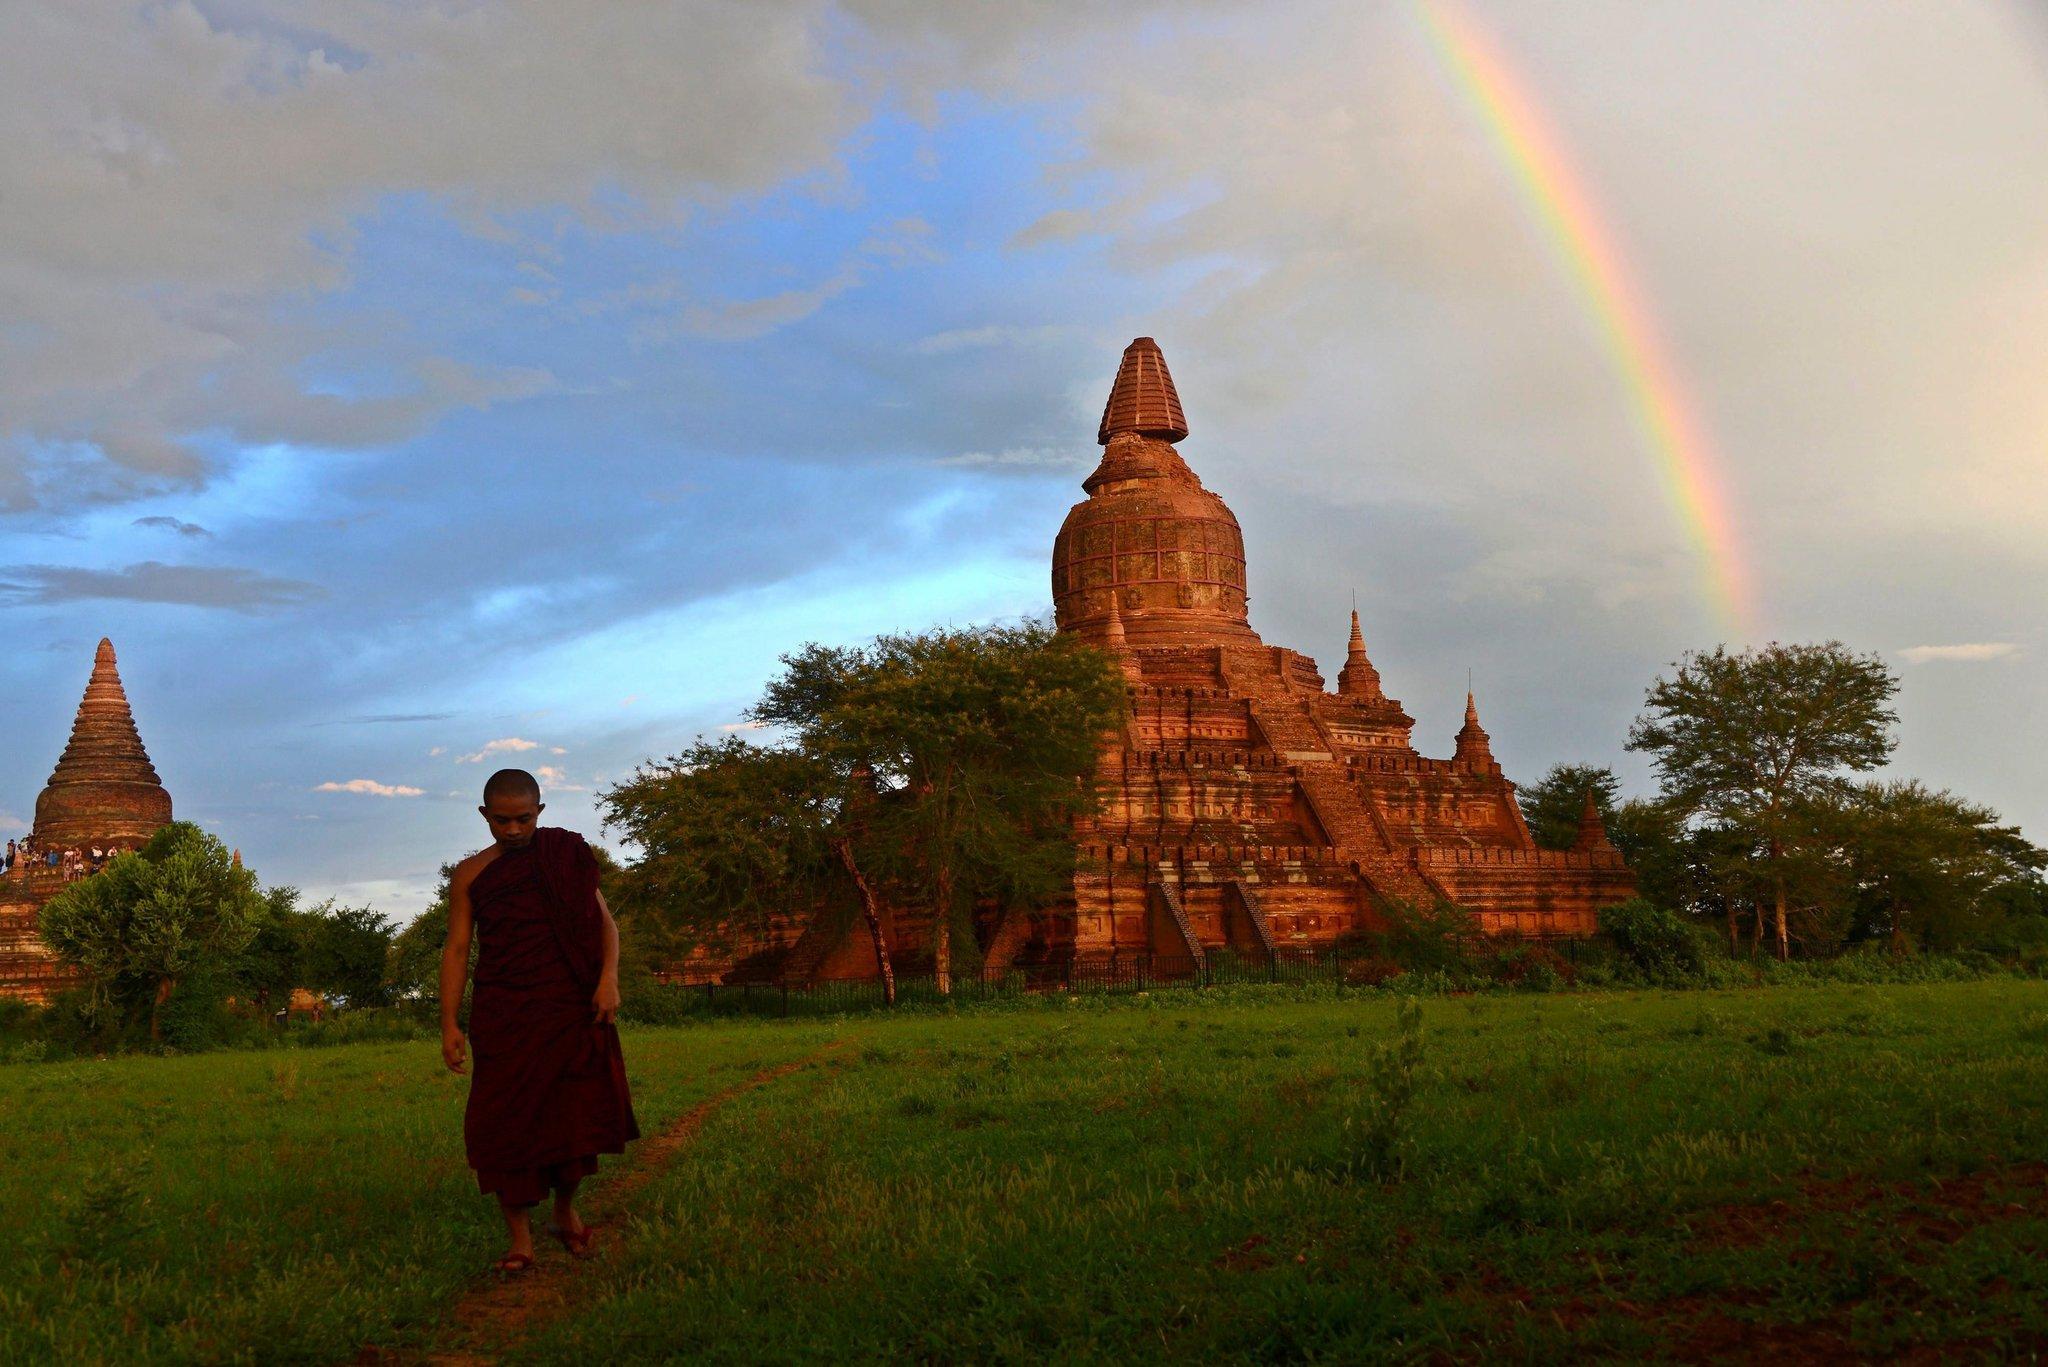 The New York Times: Myanmar Temblor Damages Ancient Temples